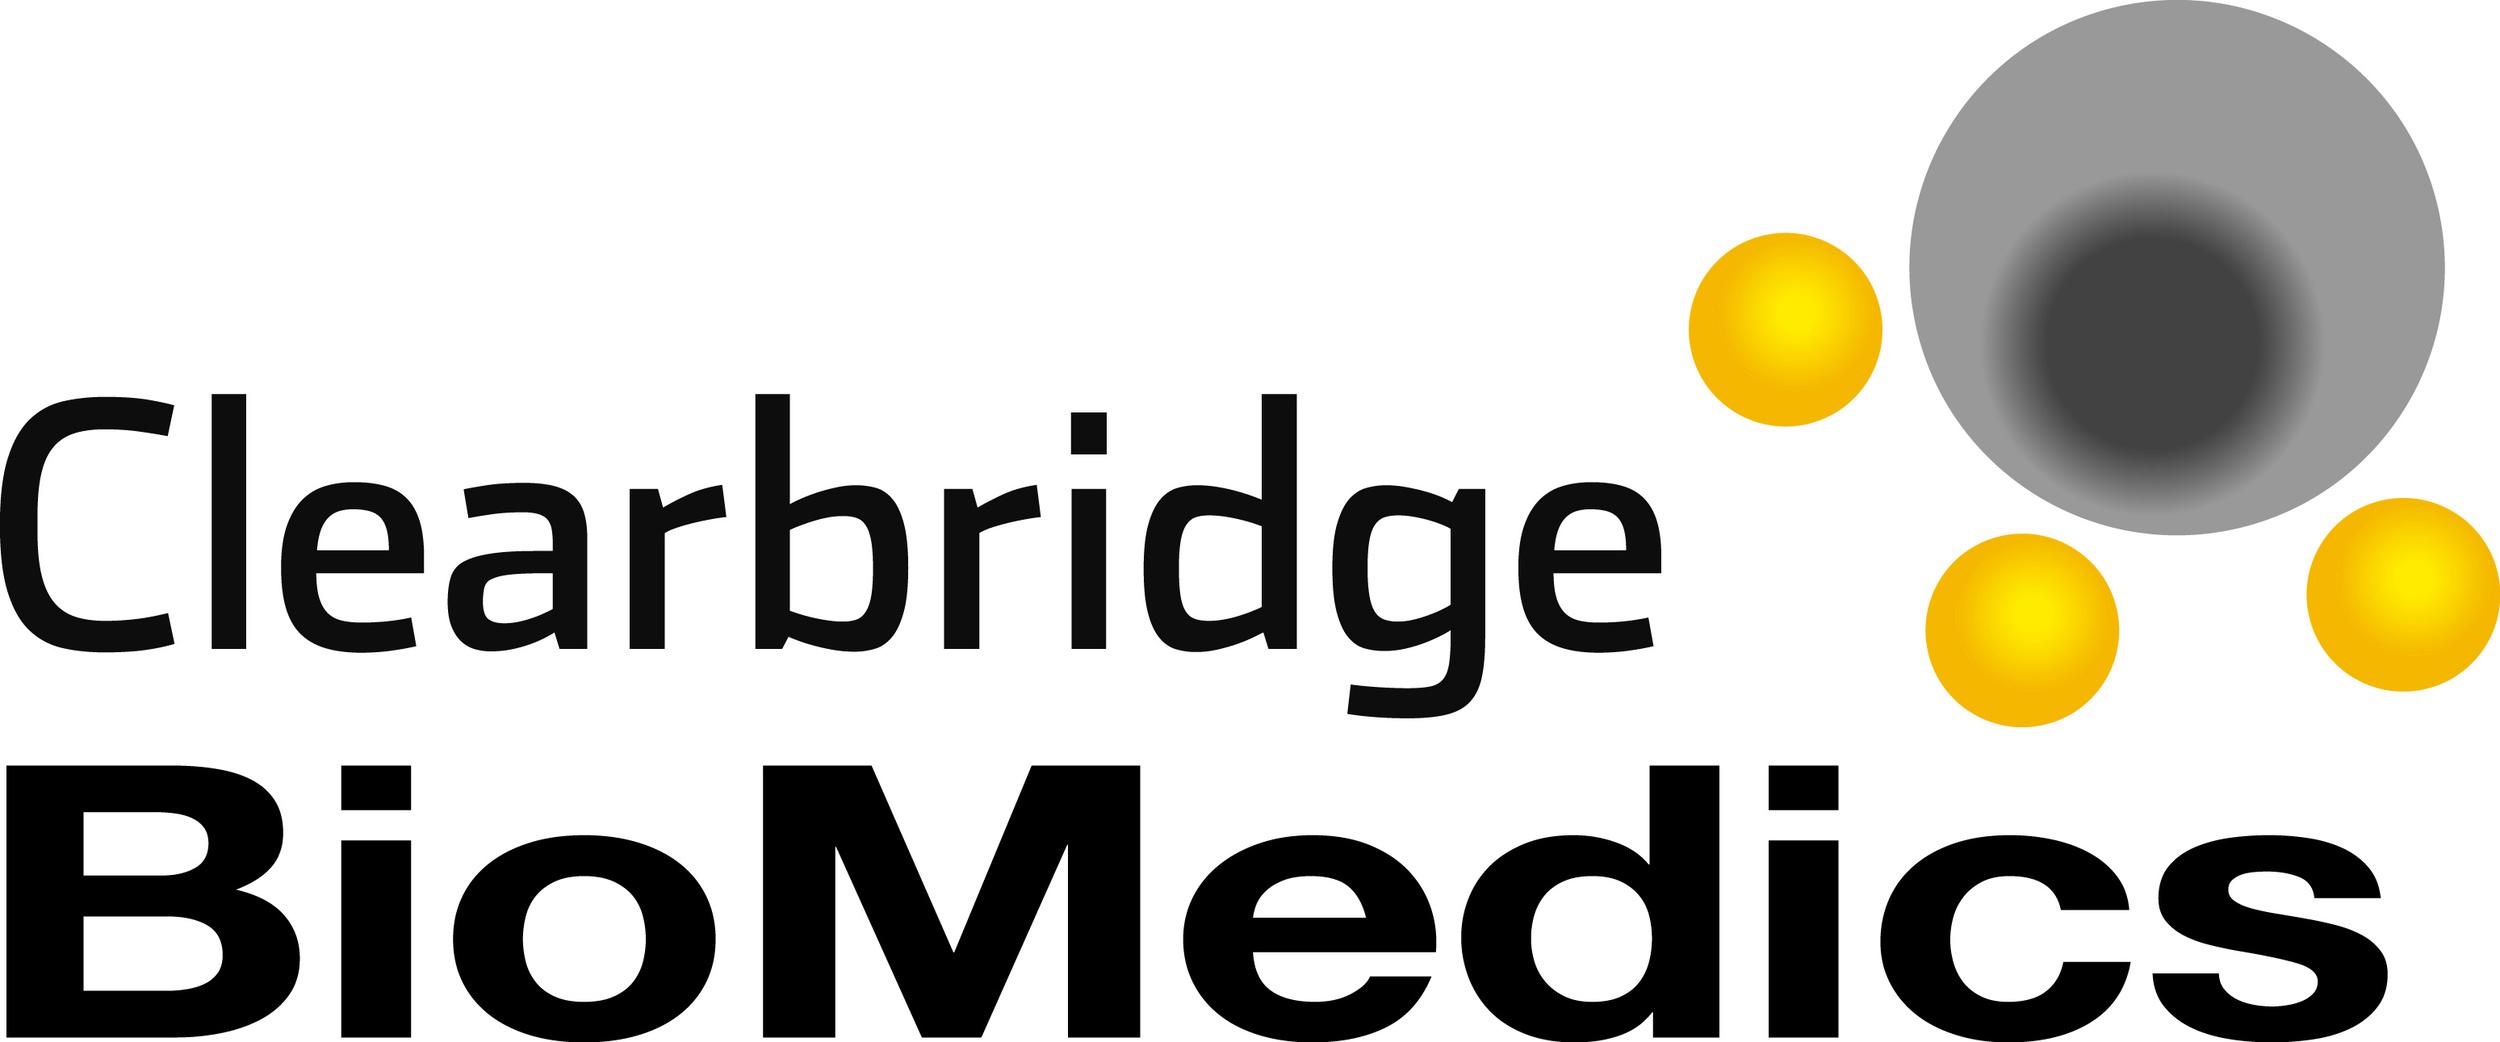 Clearbridge Biomedics Pte Ltd